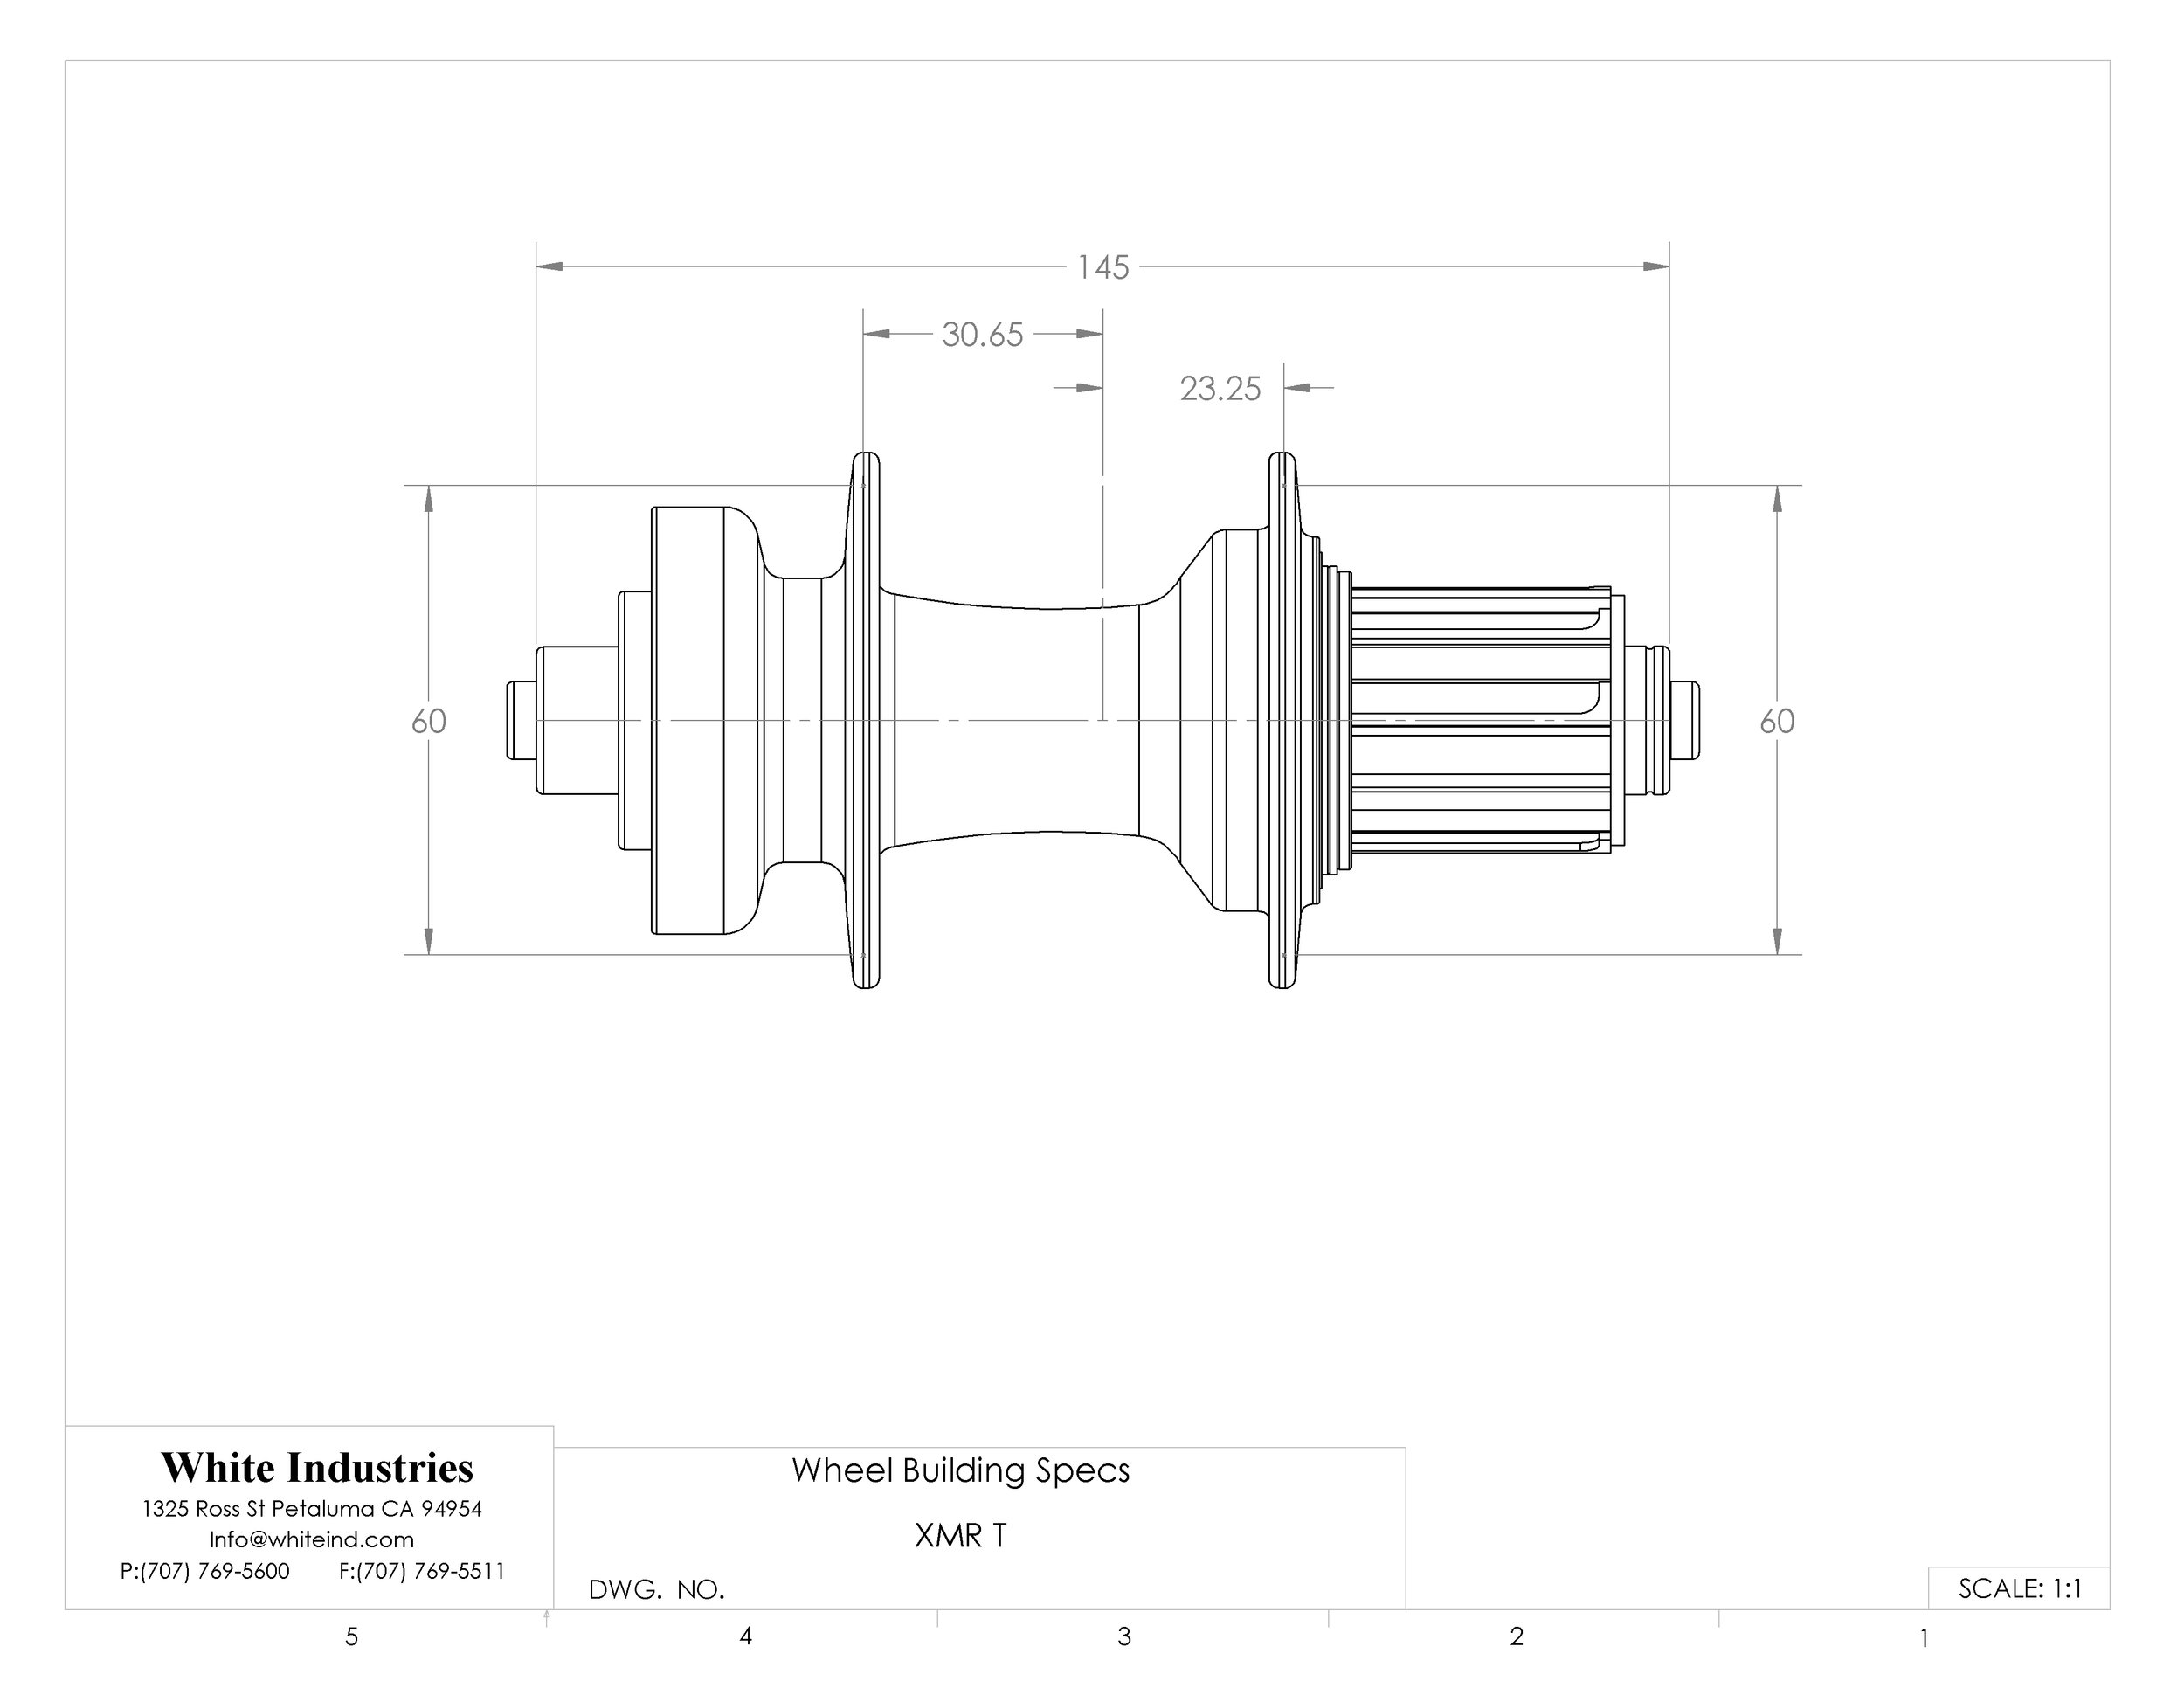 REAR XMR T WHEEL BUILDING SPECS.JPG